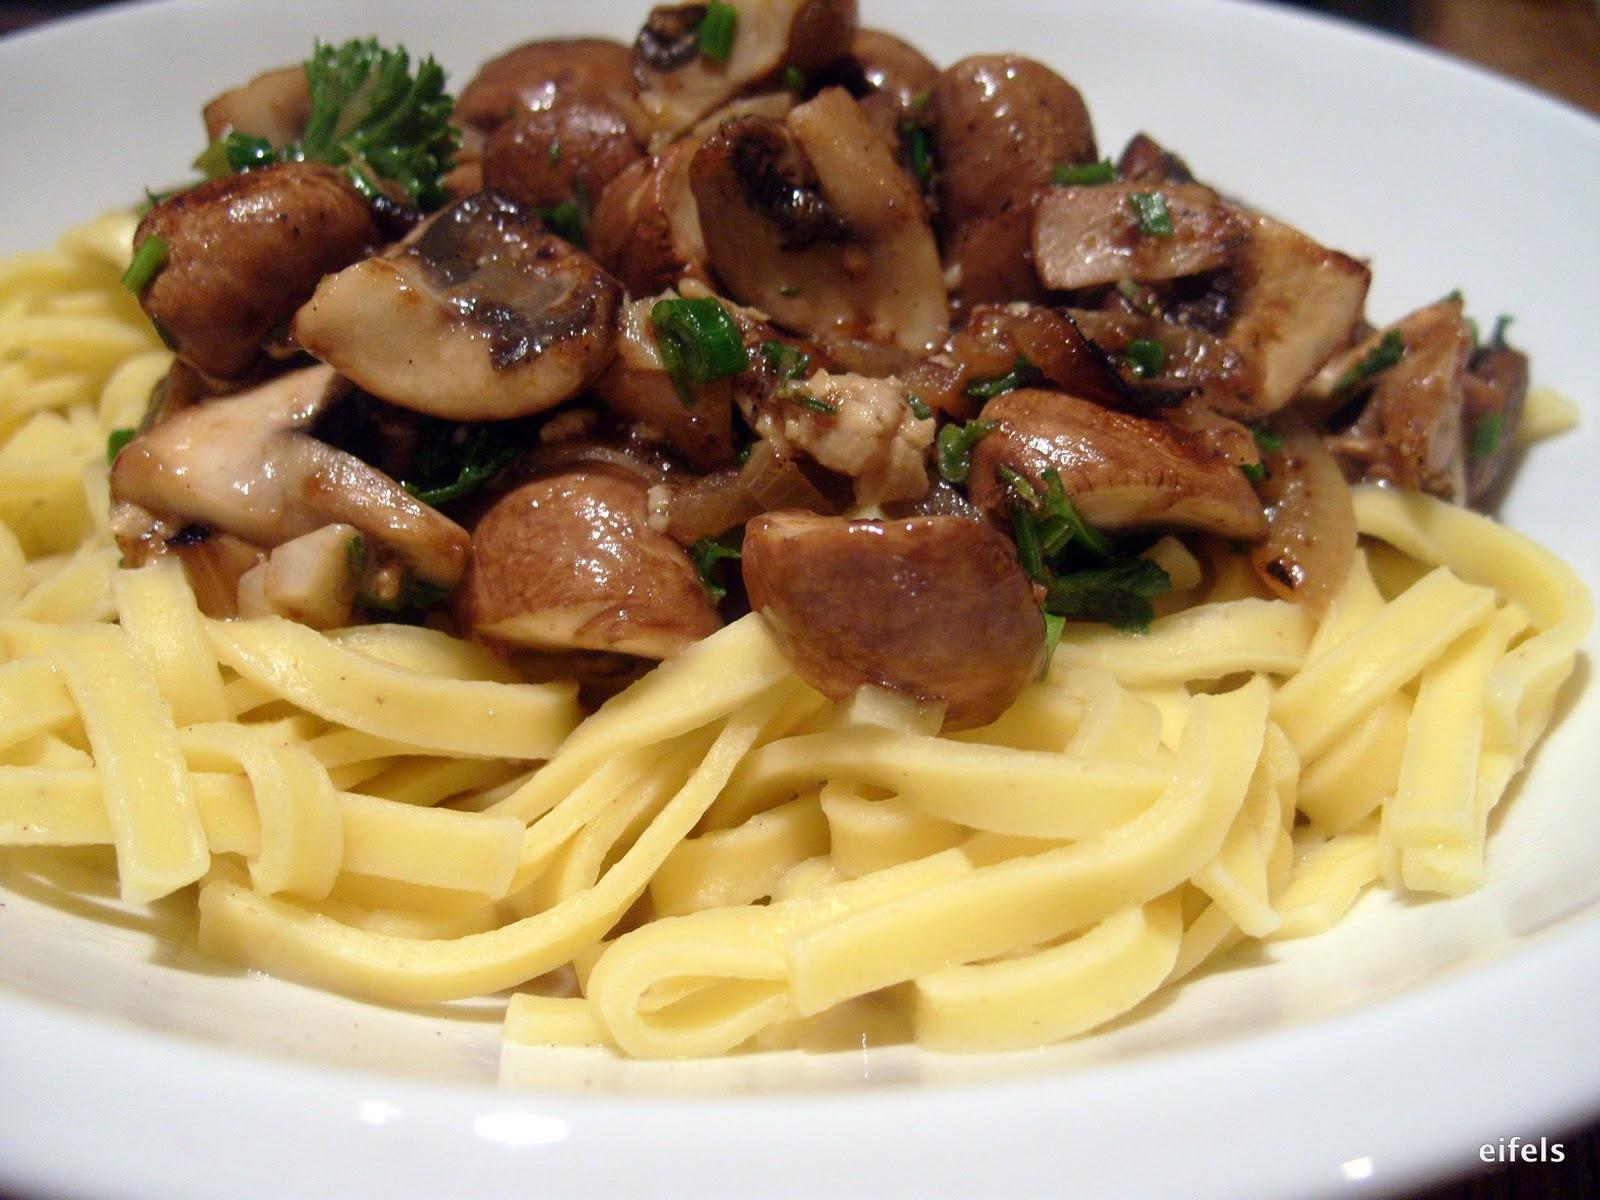 eifels kochtopf nudeln mit champignons und camembert in weisswein. Black Bedroom Furniture Sets. Home Design Ideas